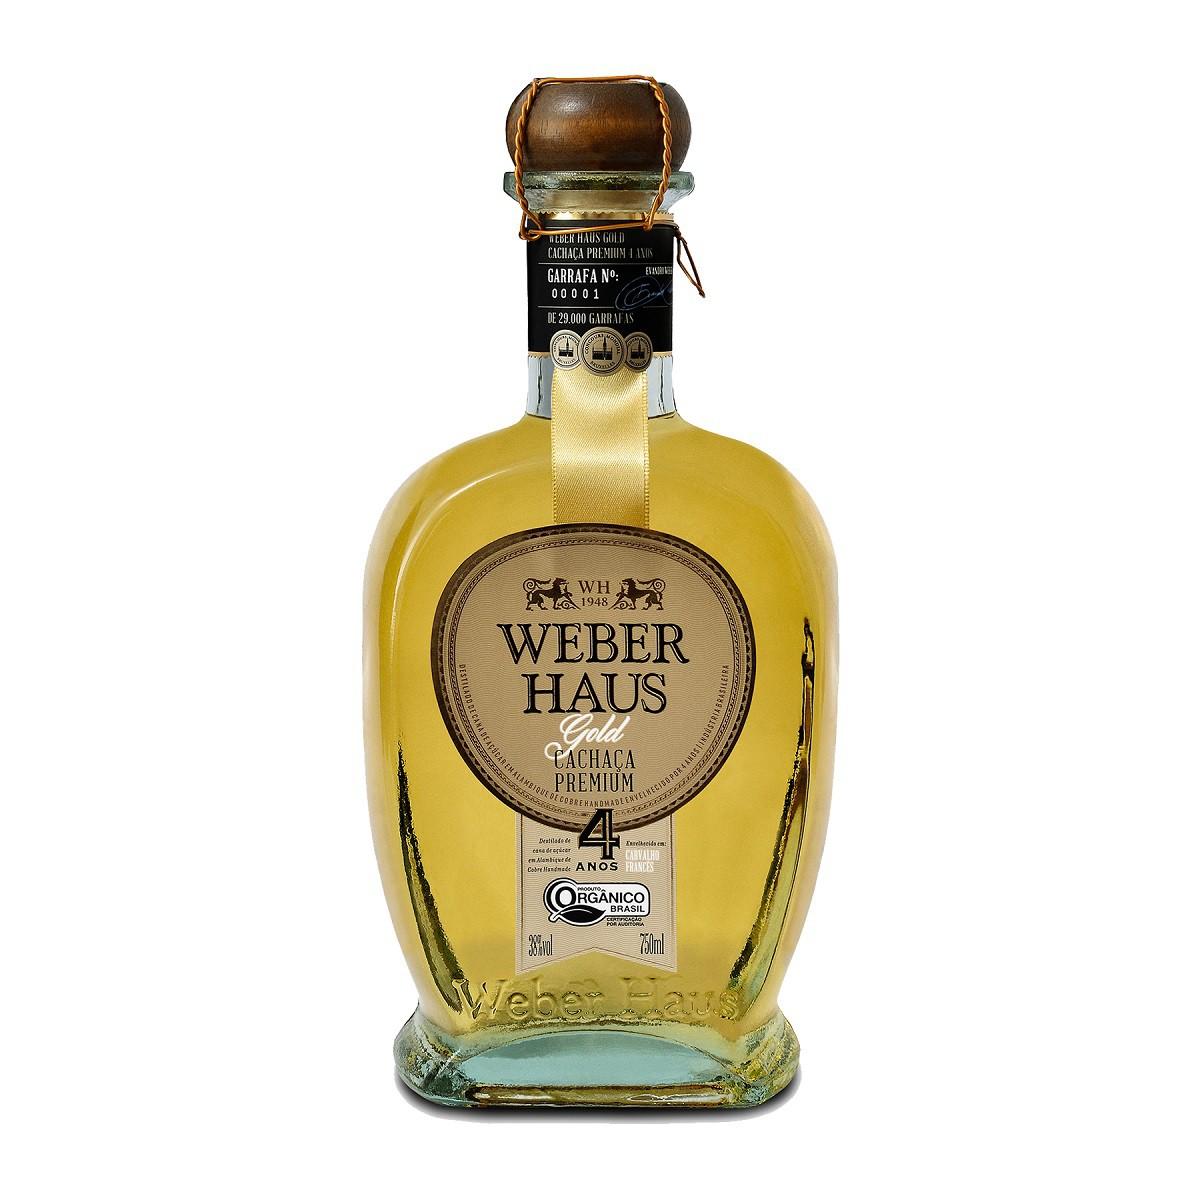 Cachaça Weber Haus  Premium Gold 4 Anos - 750ml